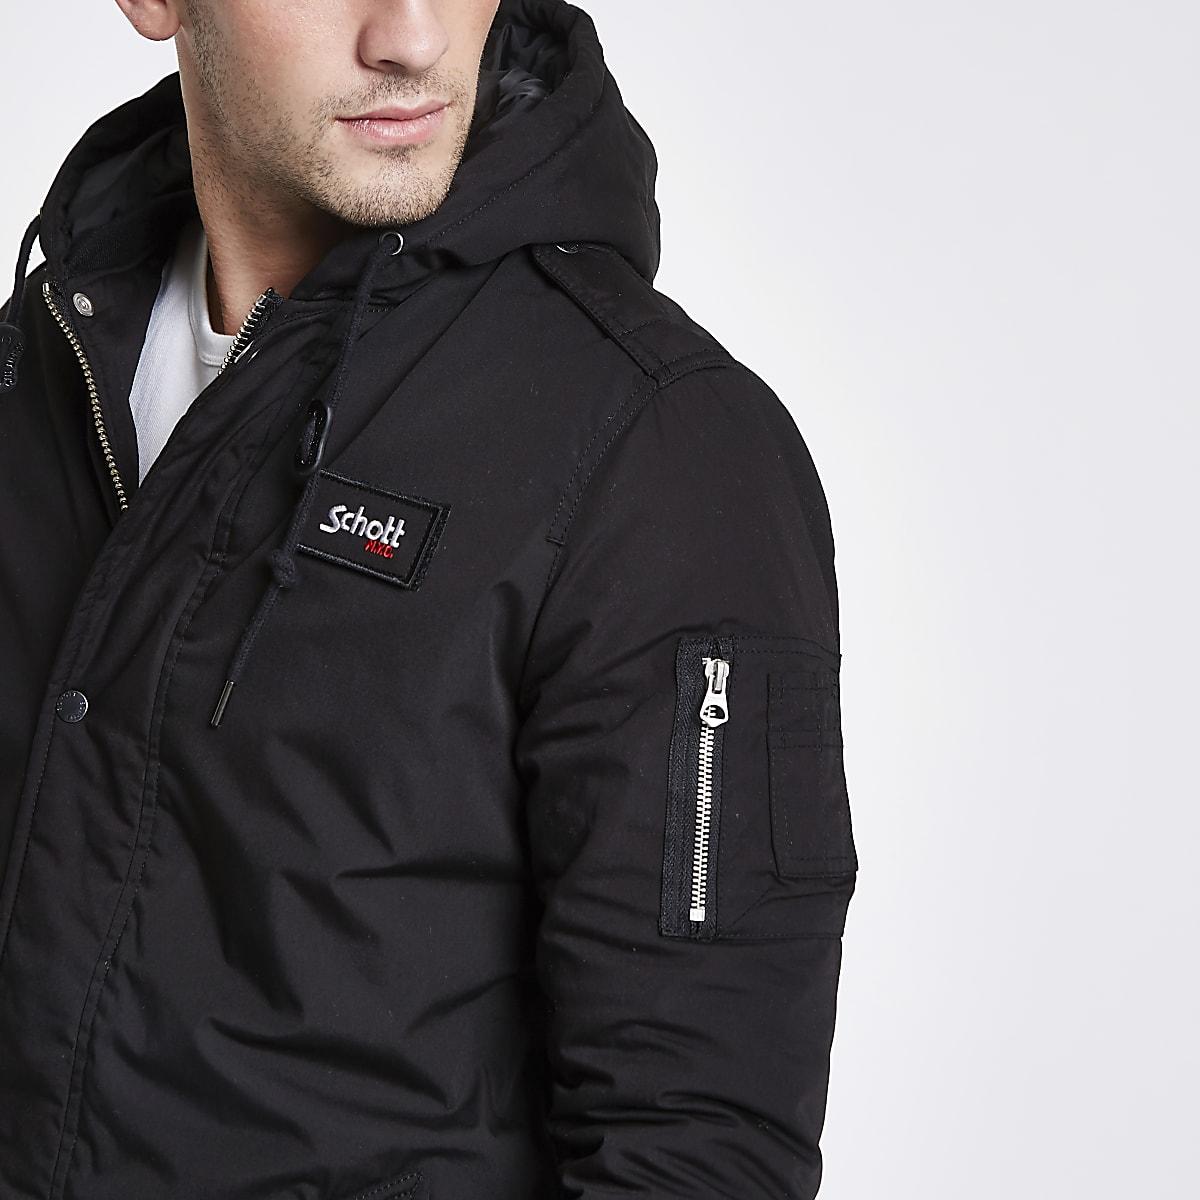 Schott black hooded jacket